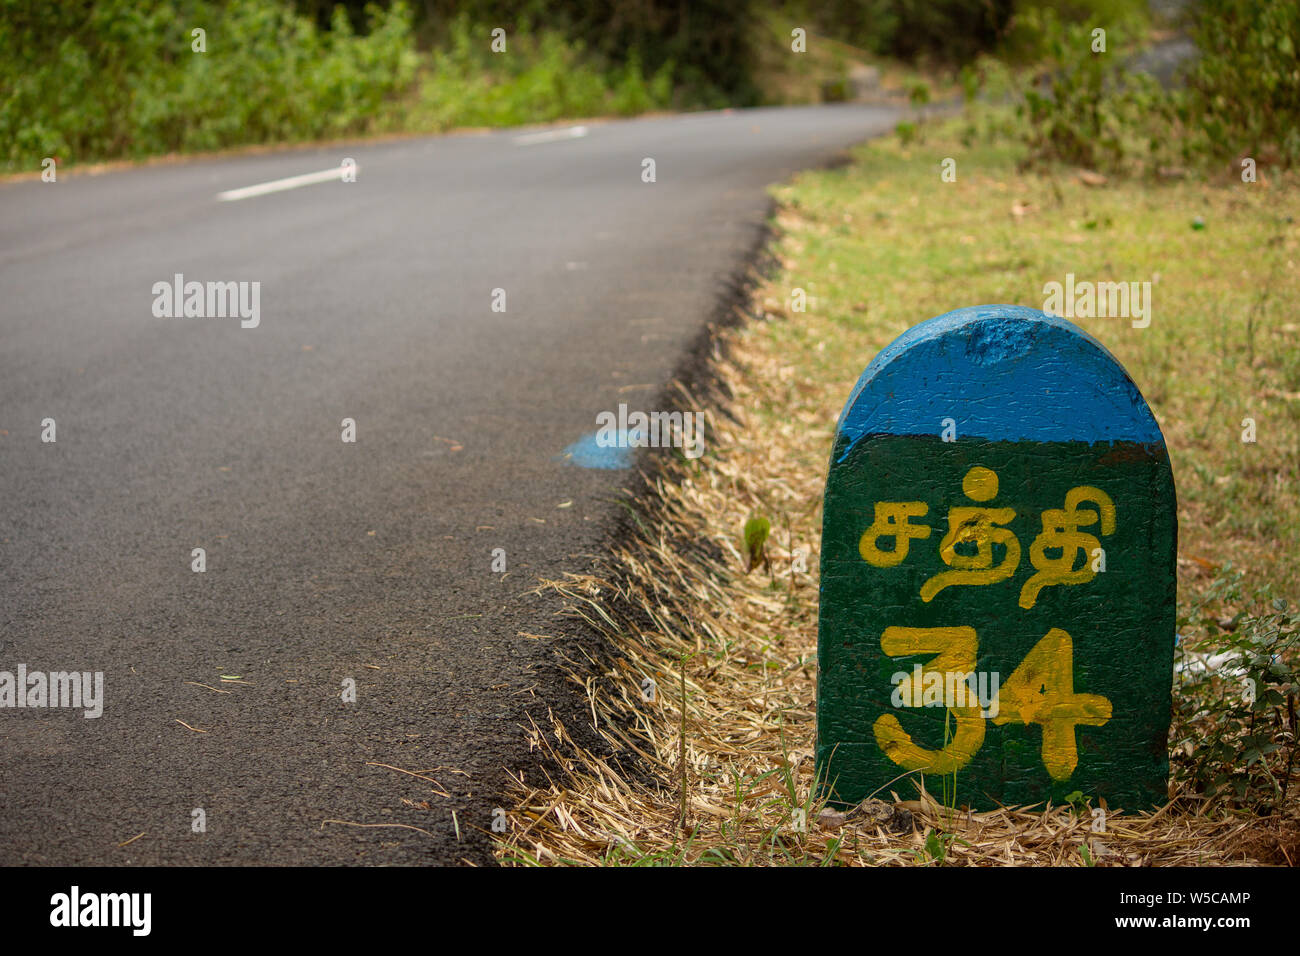 Tamil Language Stock Photos & Tamil Language Stock Images - Alamy